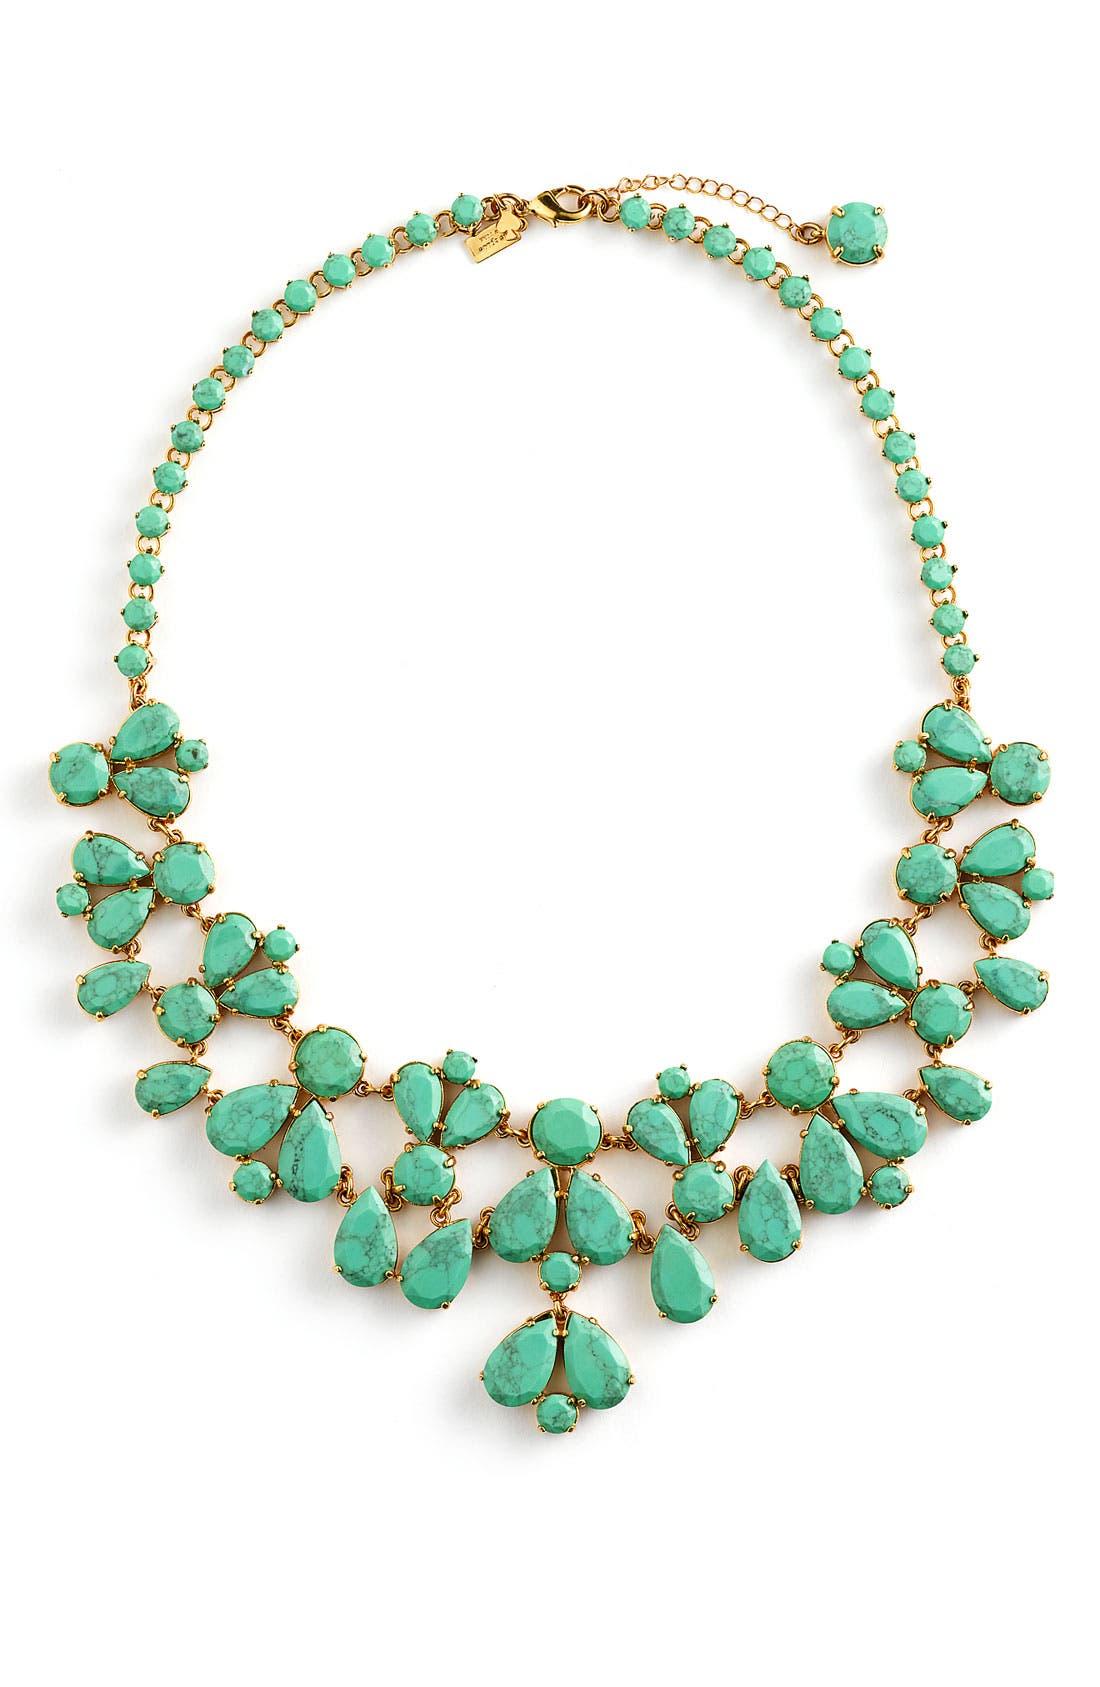 Alternate Image 1 Selected - kate spade new york 'fiorella' floral bib necklace